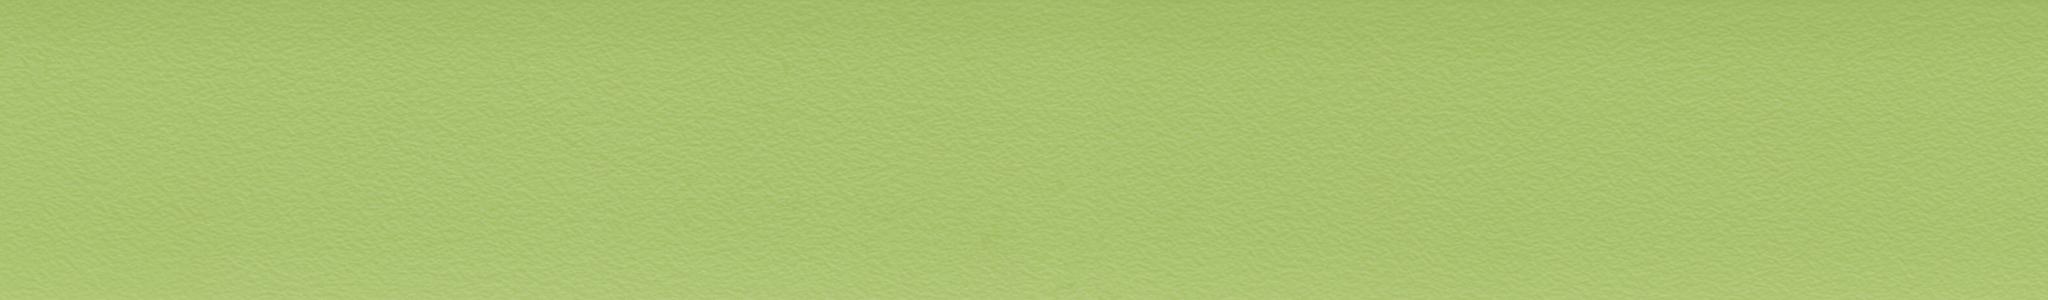 HU 16626 ABS hrana zelená kiwi perla XG